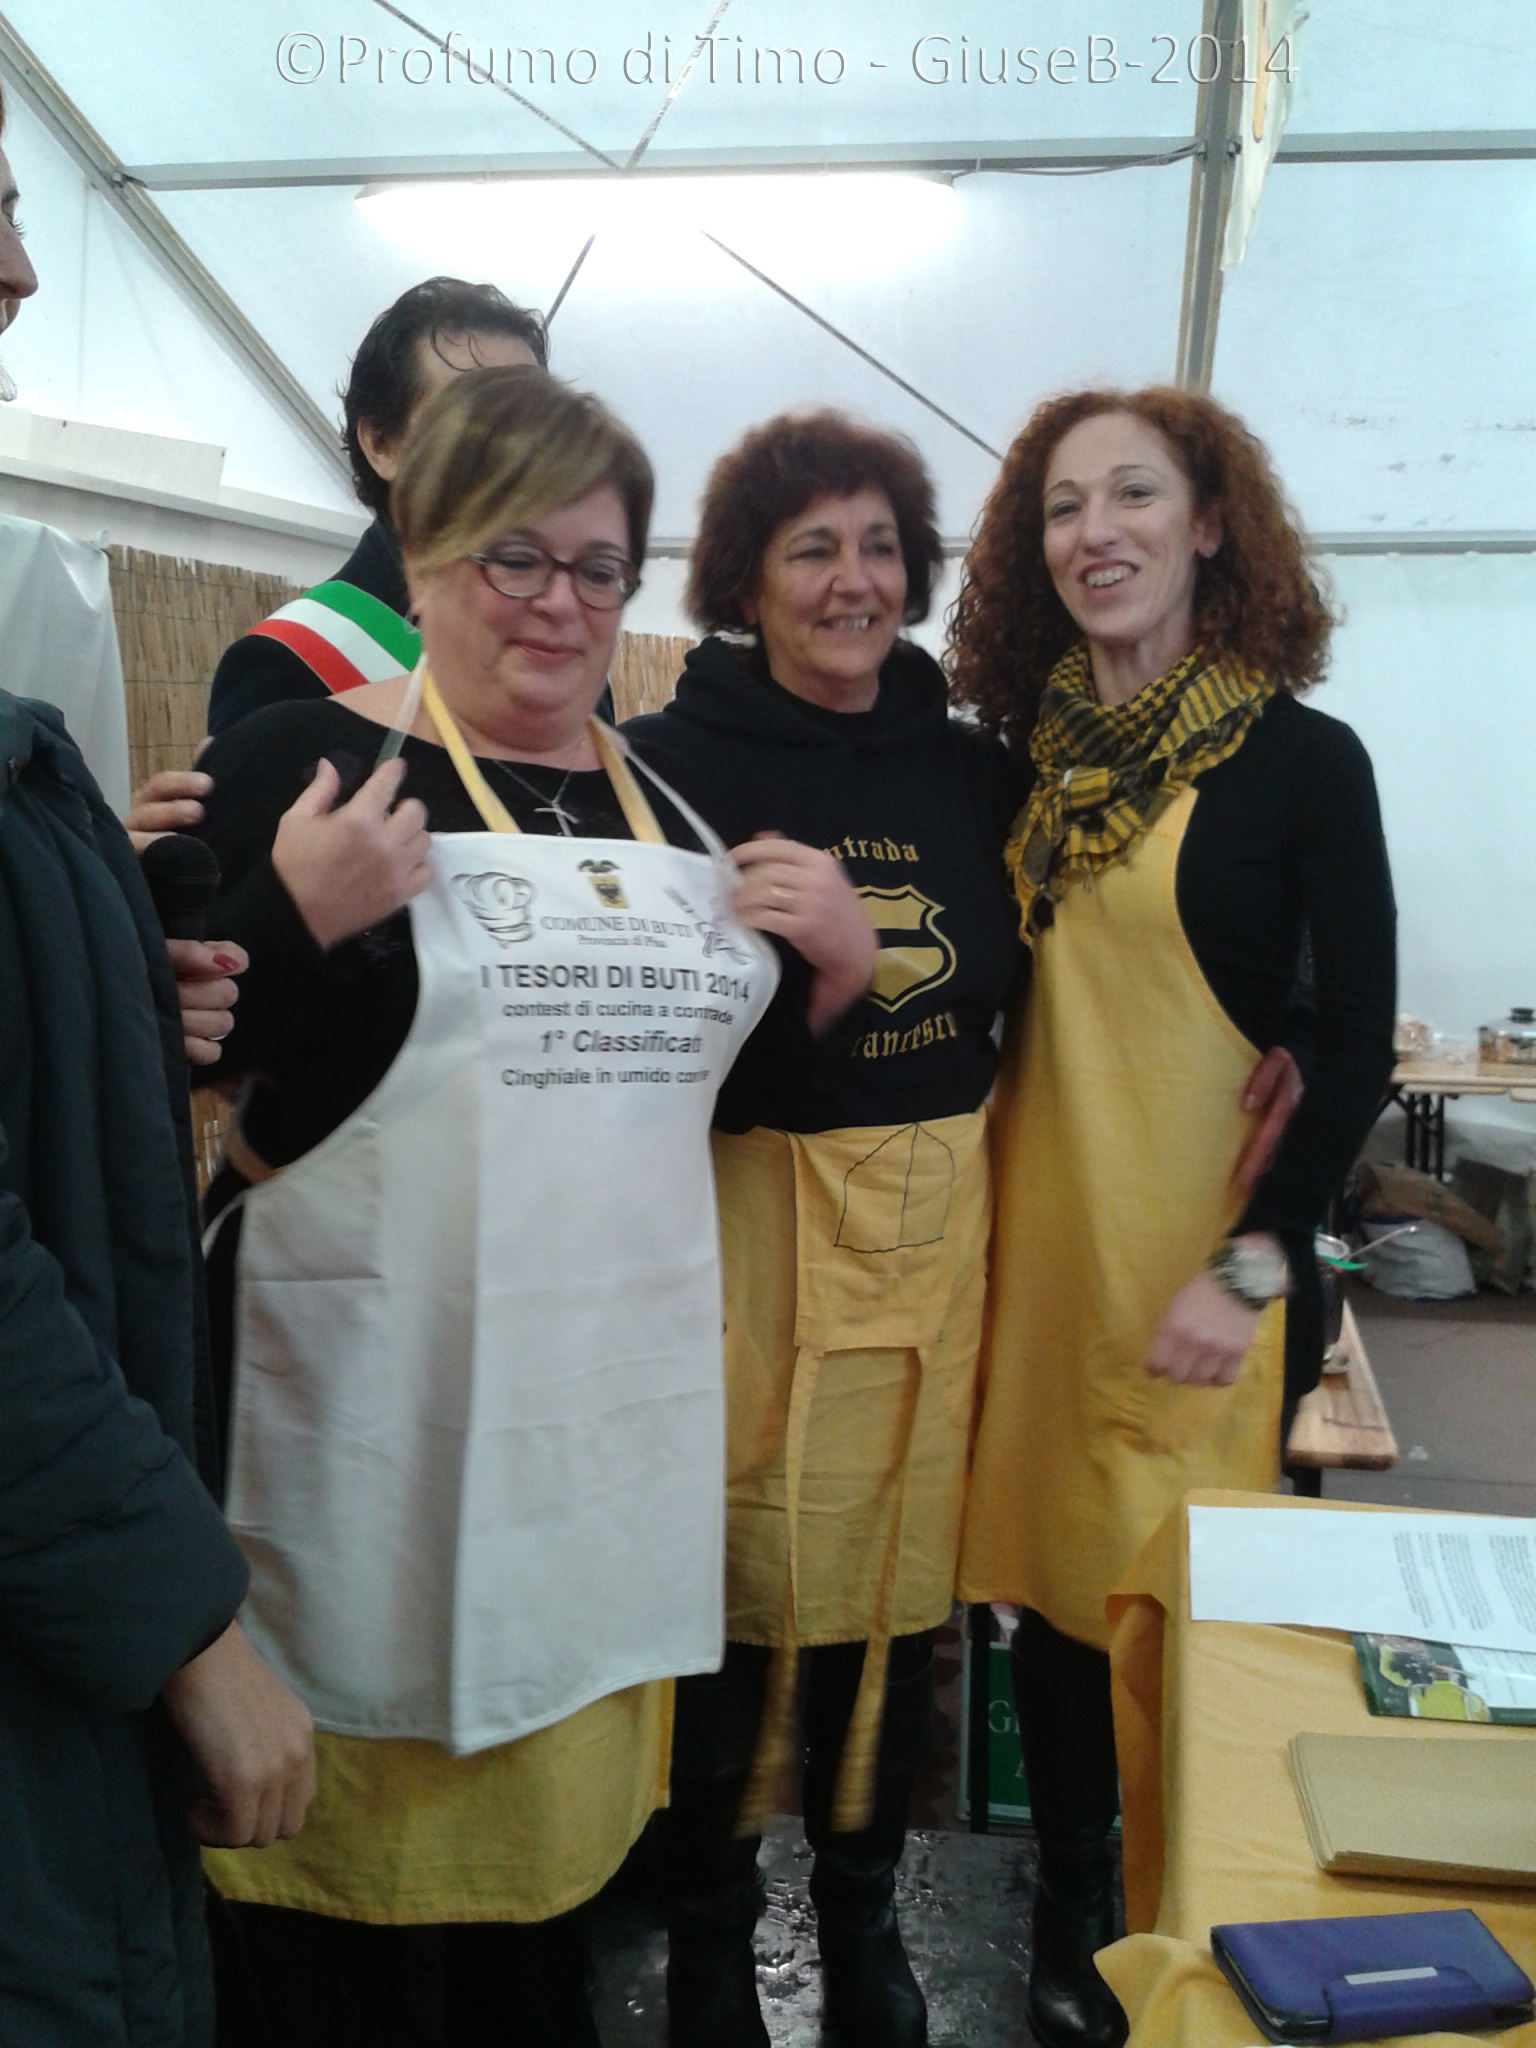 premio Cinghiale in umido con Olive Contrada San Francesco